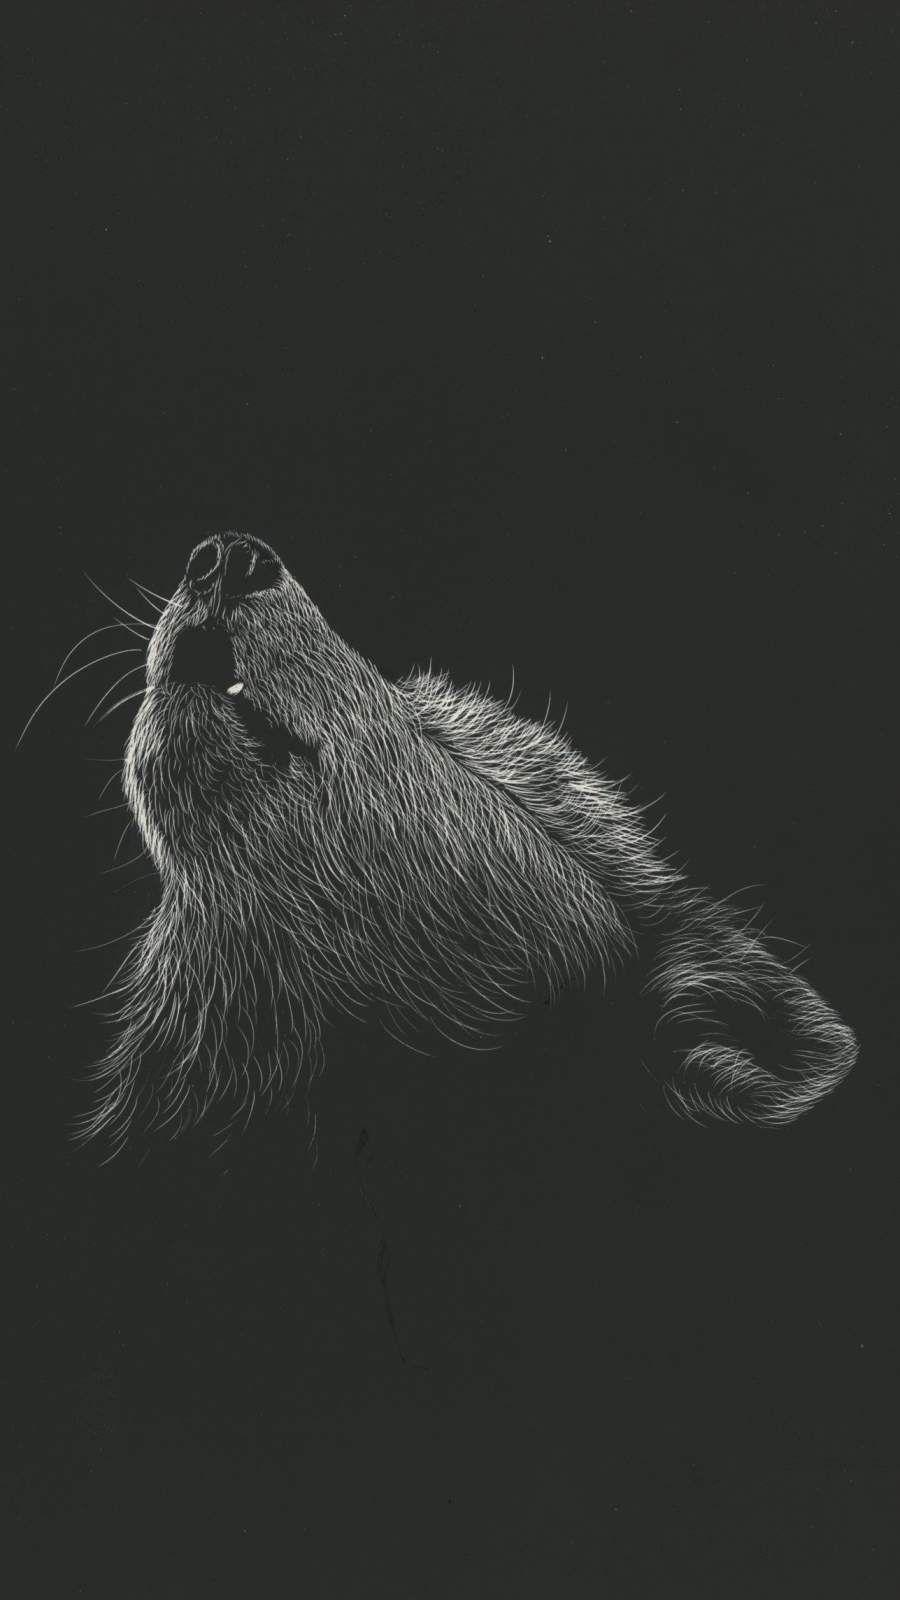 The Wolf Among Us iPhone Wallpaper The wolf among us Animal 900x1600